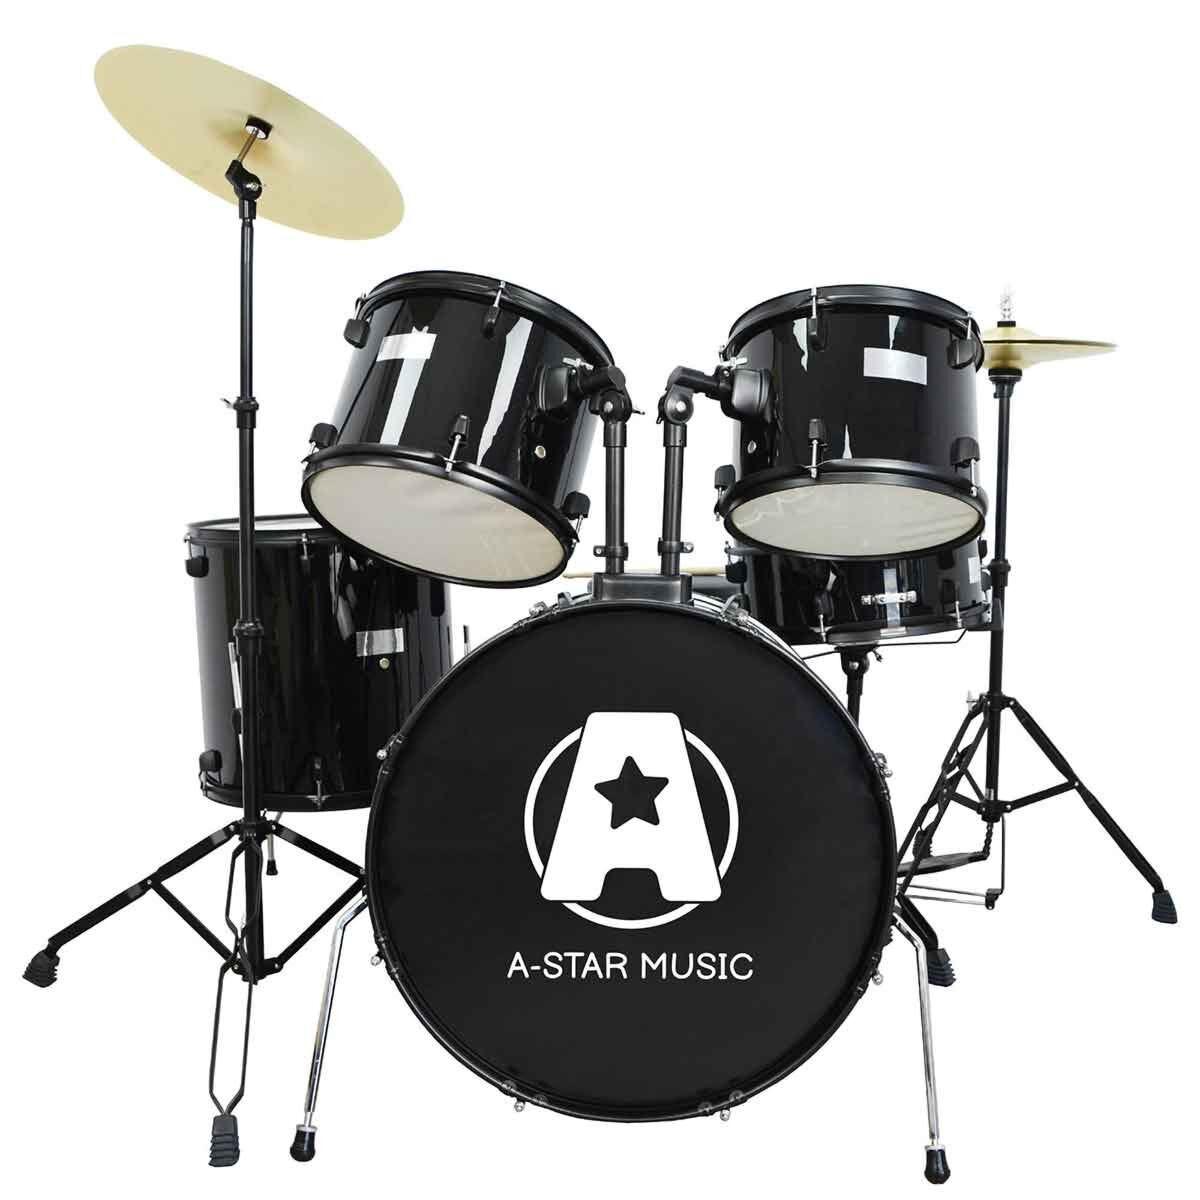 A-Star Rocket 5 Piece Drum Kit